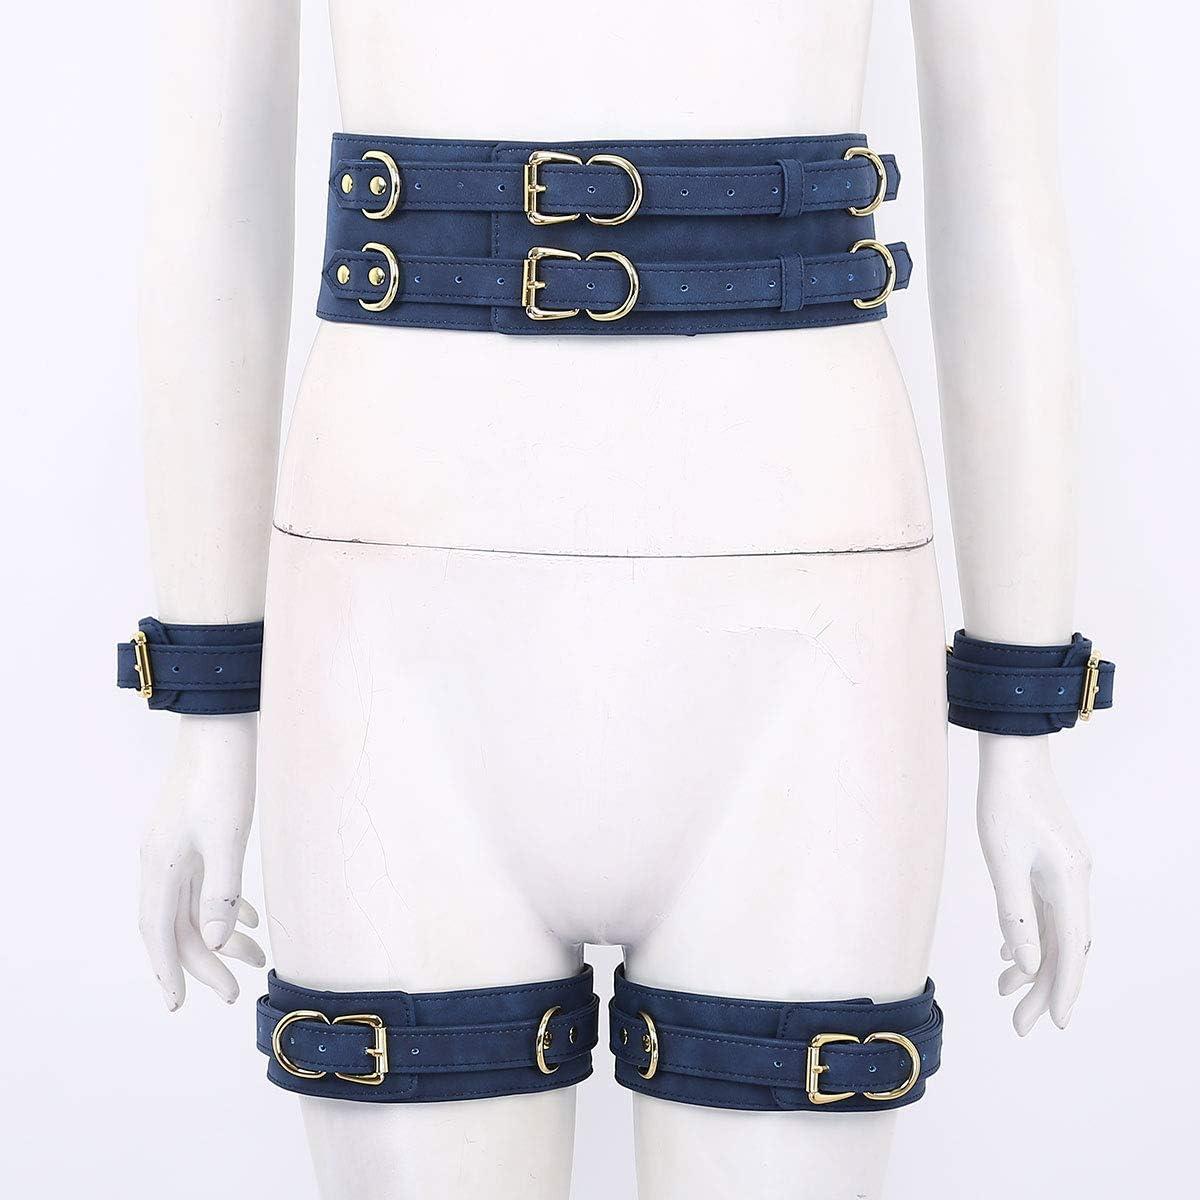 Alvivi Unisexe Costume Sado MASO Jambe Harnais PU Cuir avec Menotte Poignets Forme X Bandage R/églable Porte-Jarretelles Sangle Rivet Tenue Jeux Plaisir